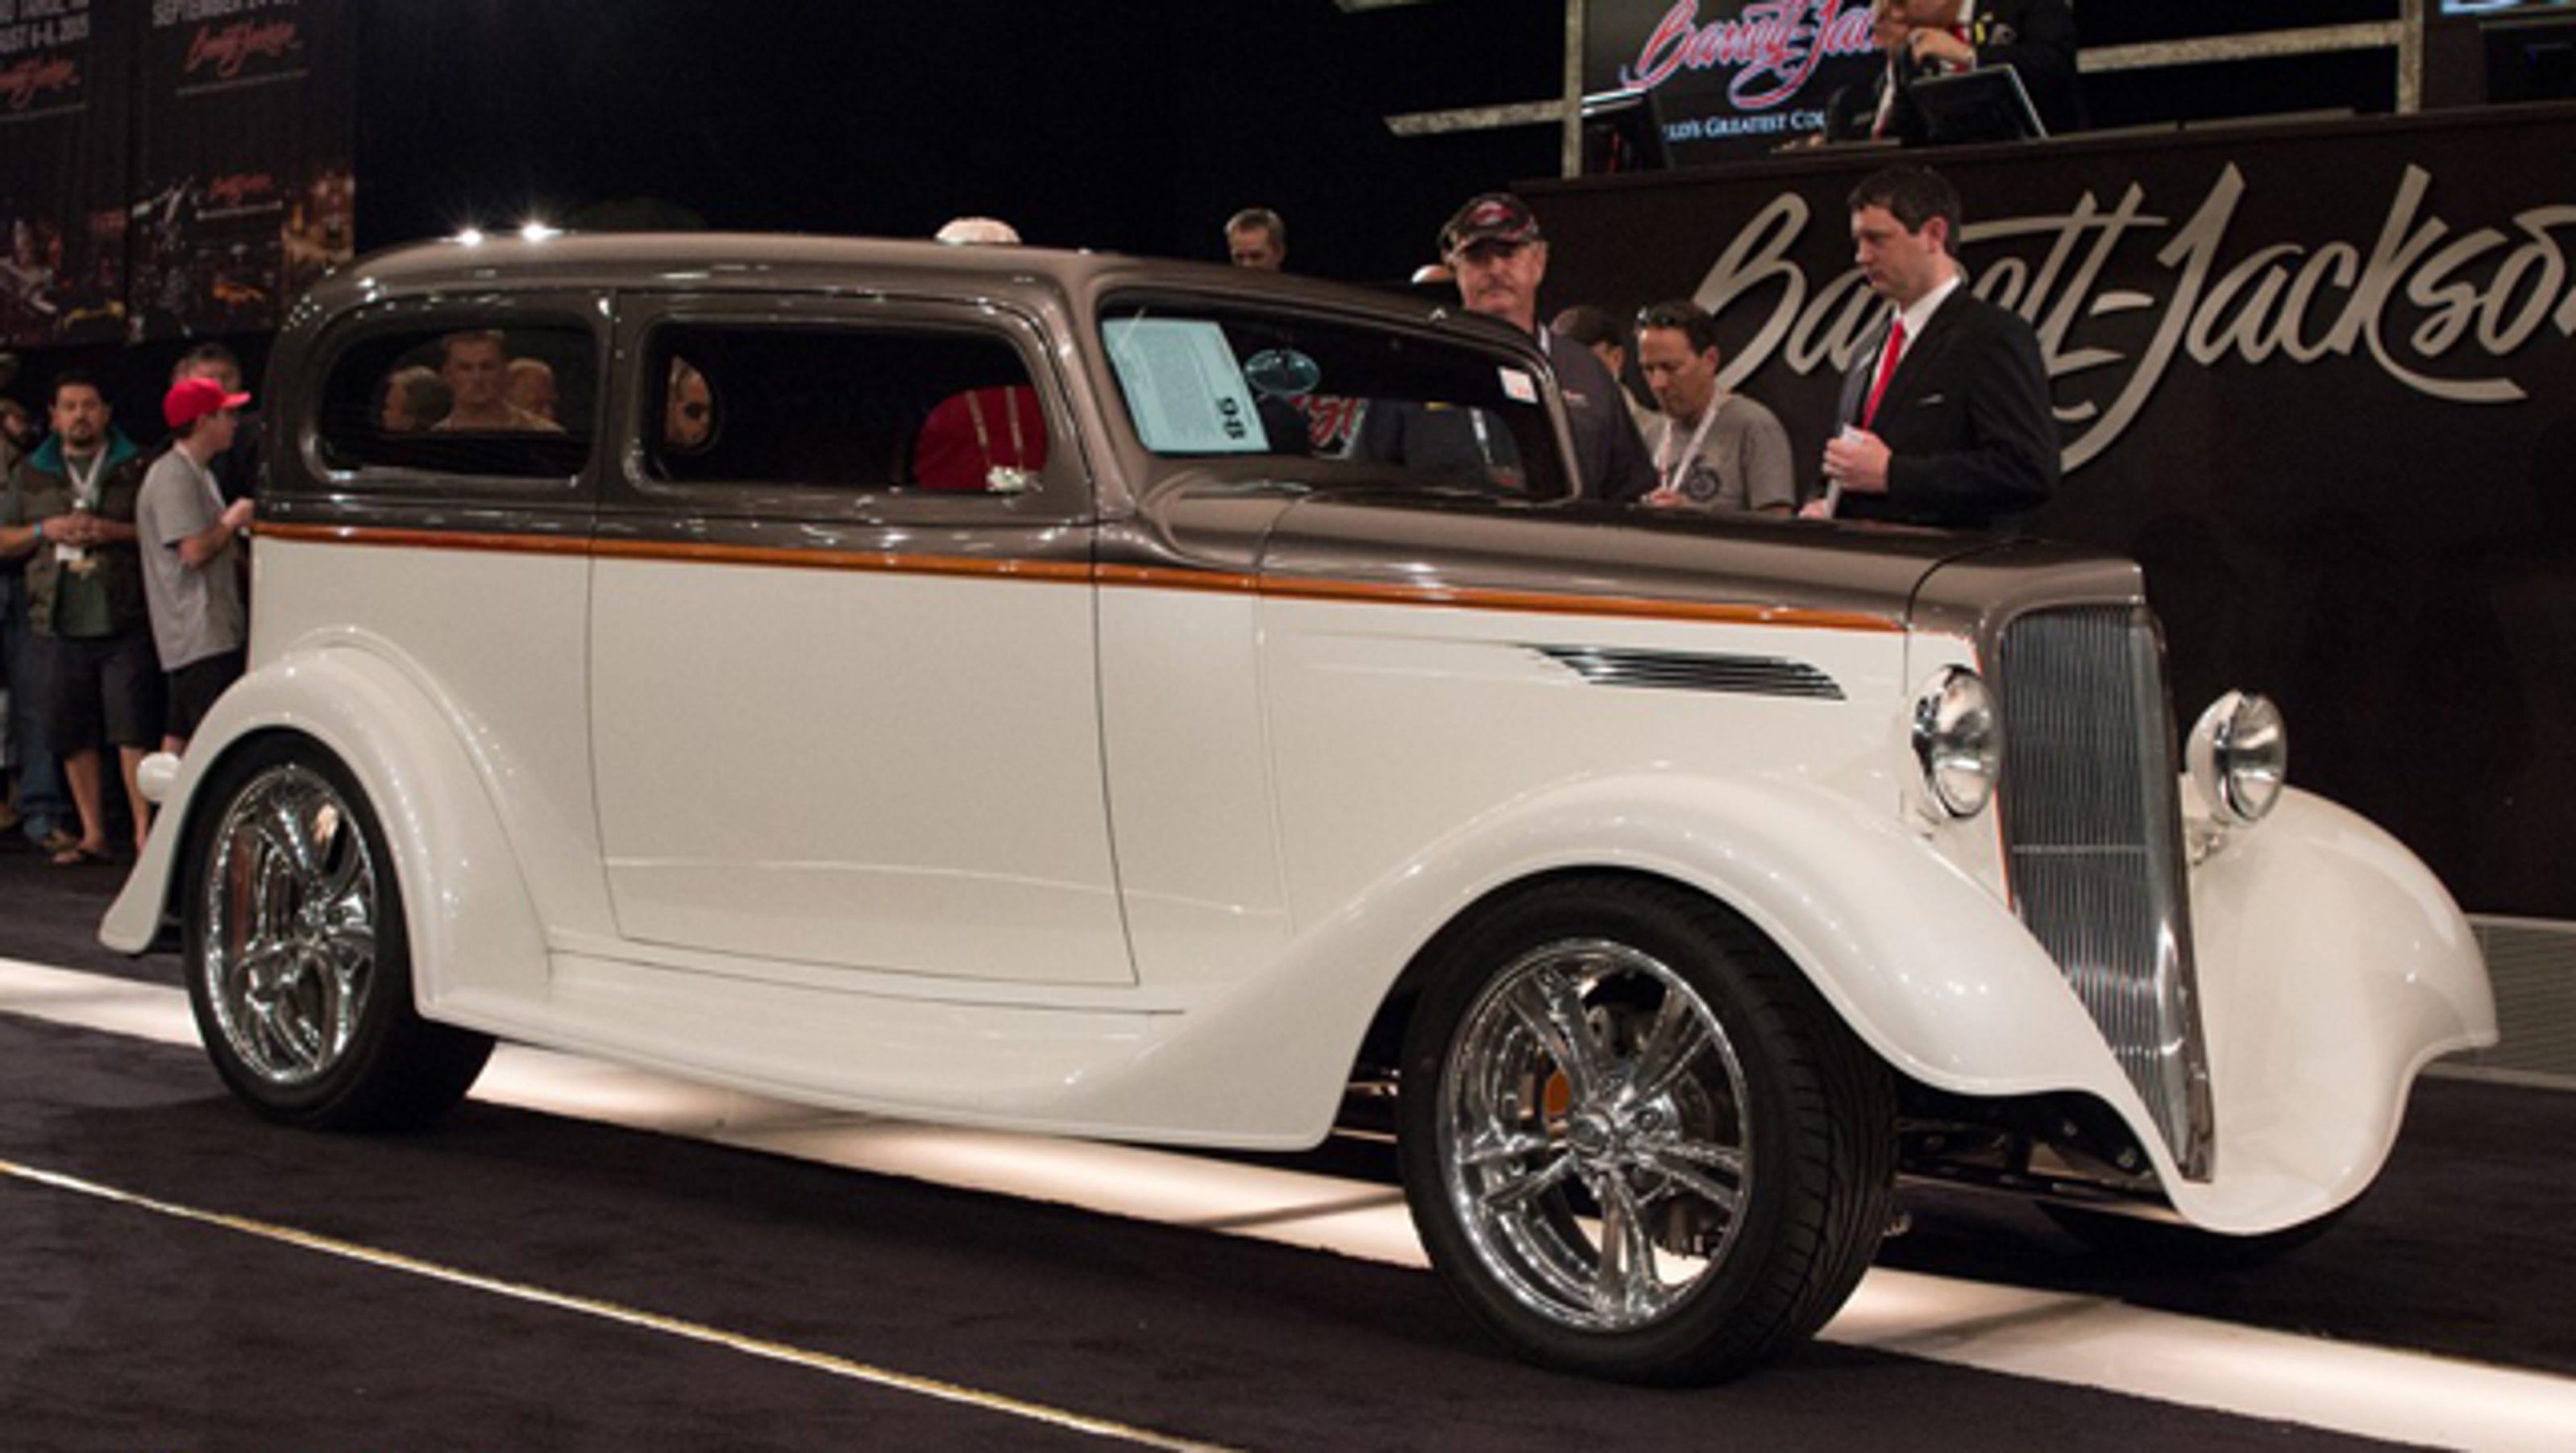 Recap barrett jackson cars nab 1 5 million on monday for 1933 chevrolet 2 door sedan